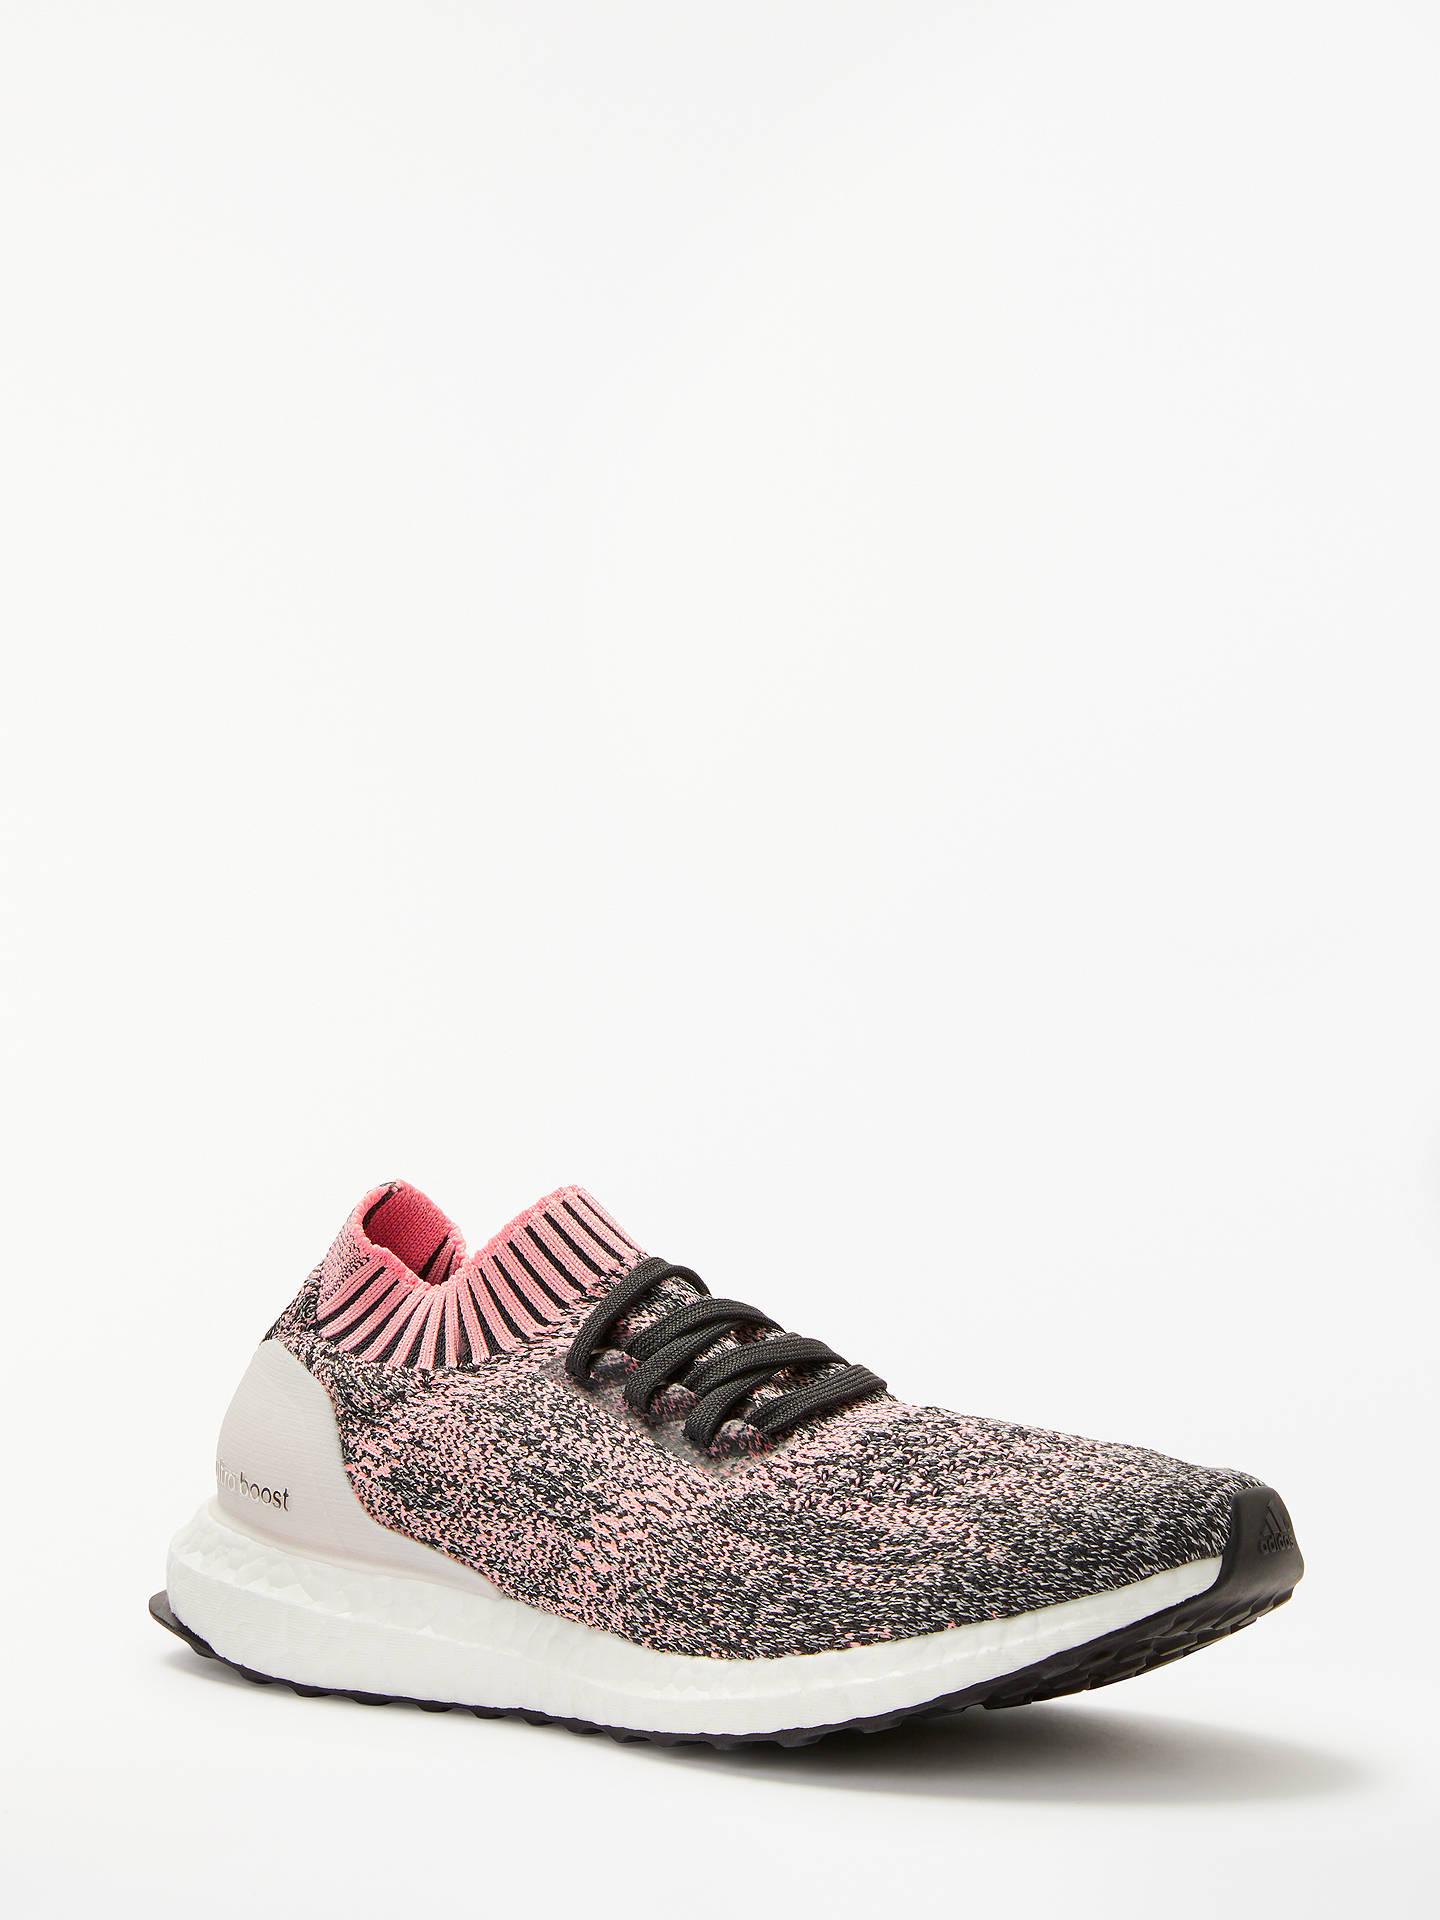 c77b12f72b81d ... Buy adidas UltraBOOST Uncaged Women s Running Shoes